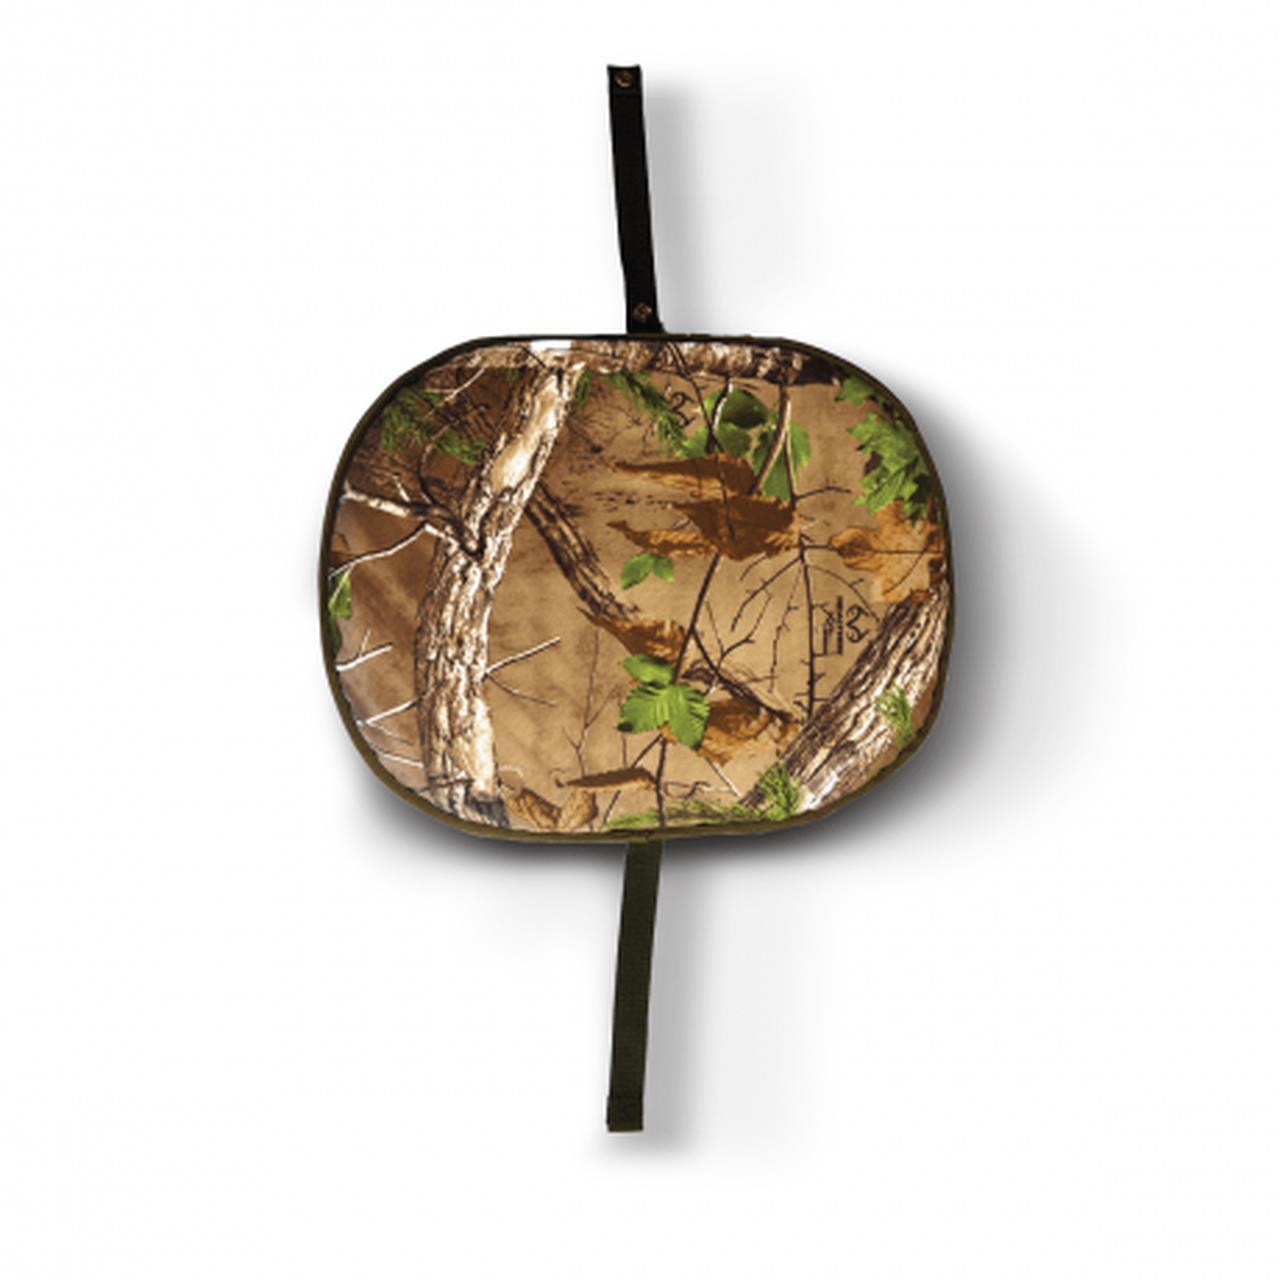 Hunters Specialties 100153 Realtree Edge Camo Hunting Tripod Chair